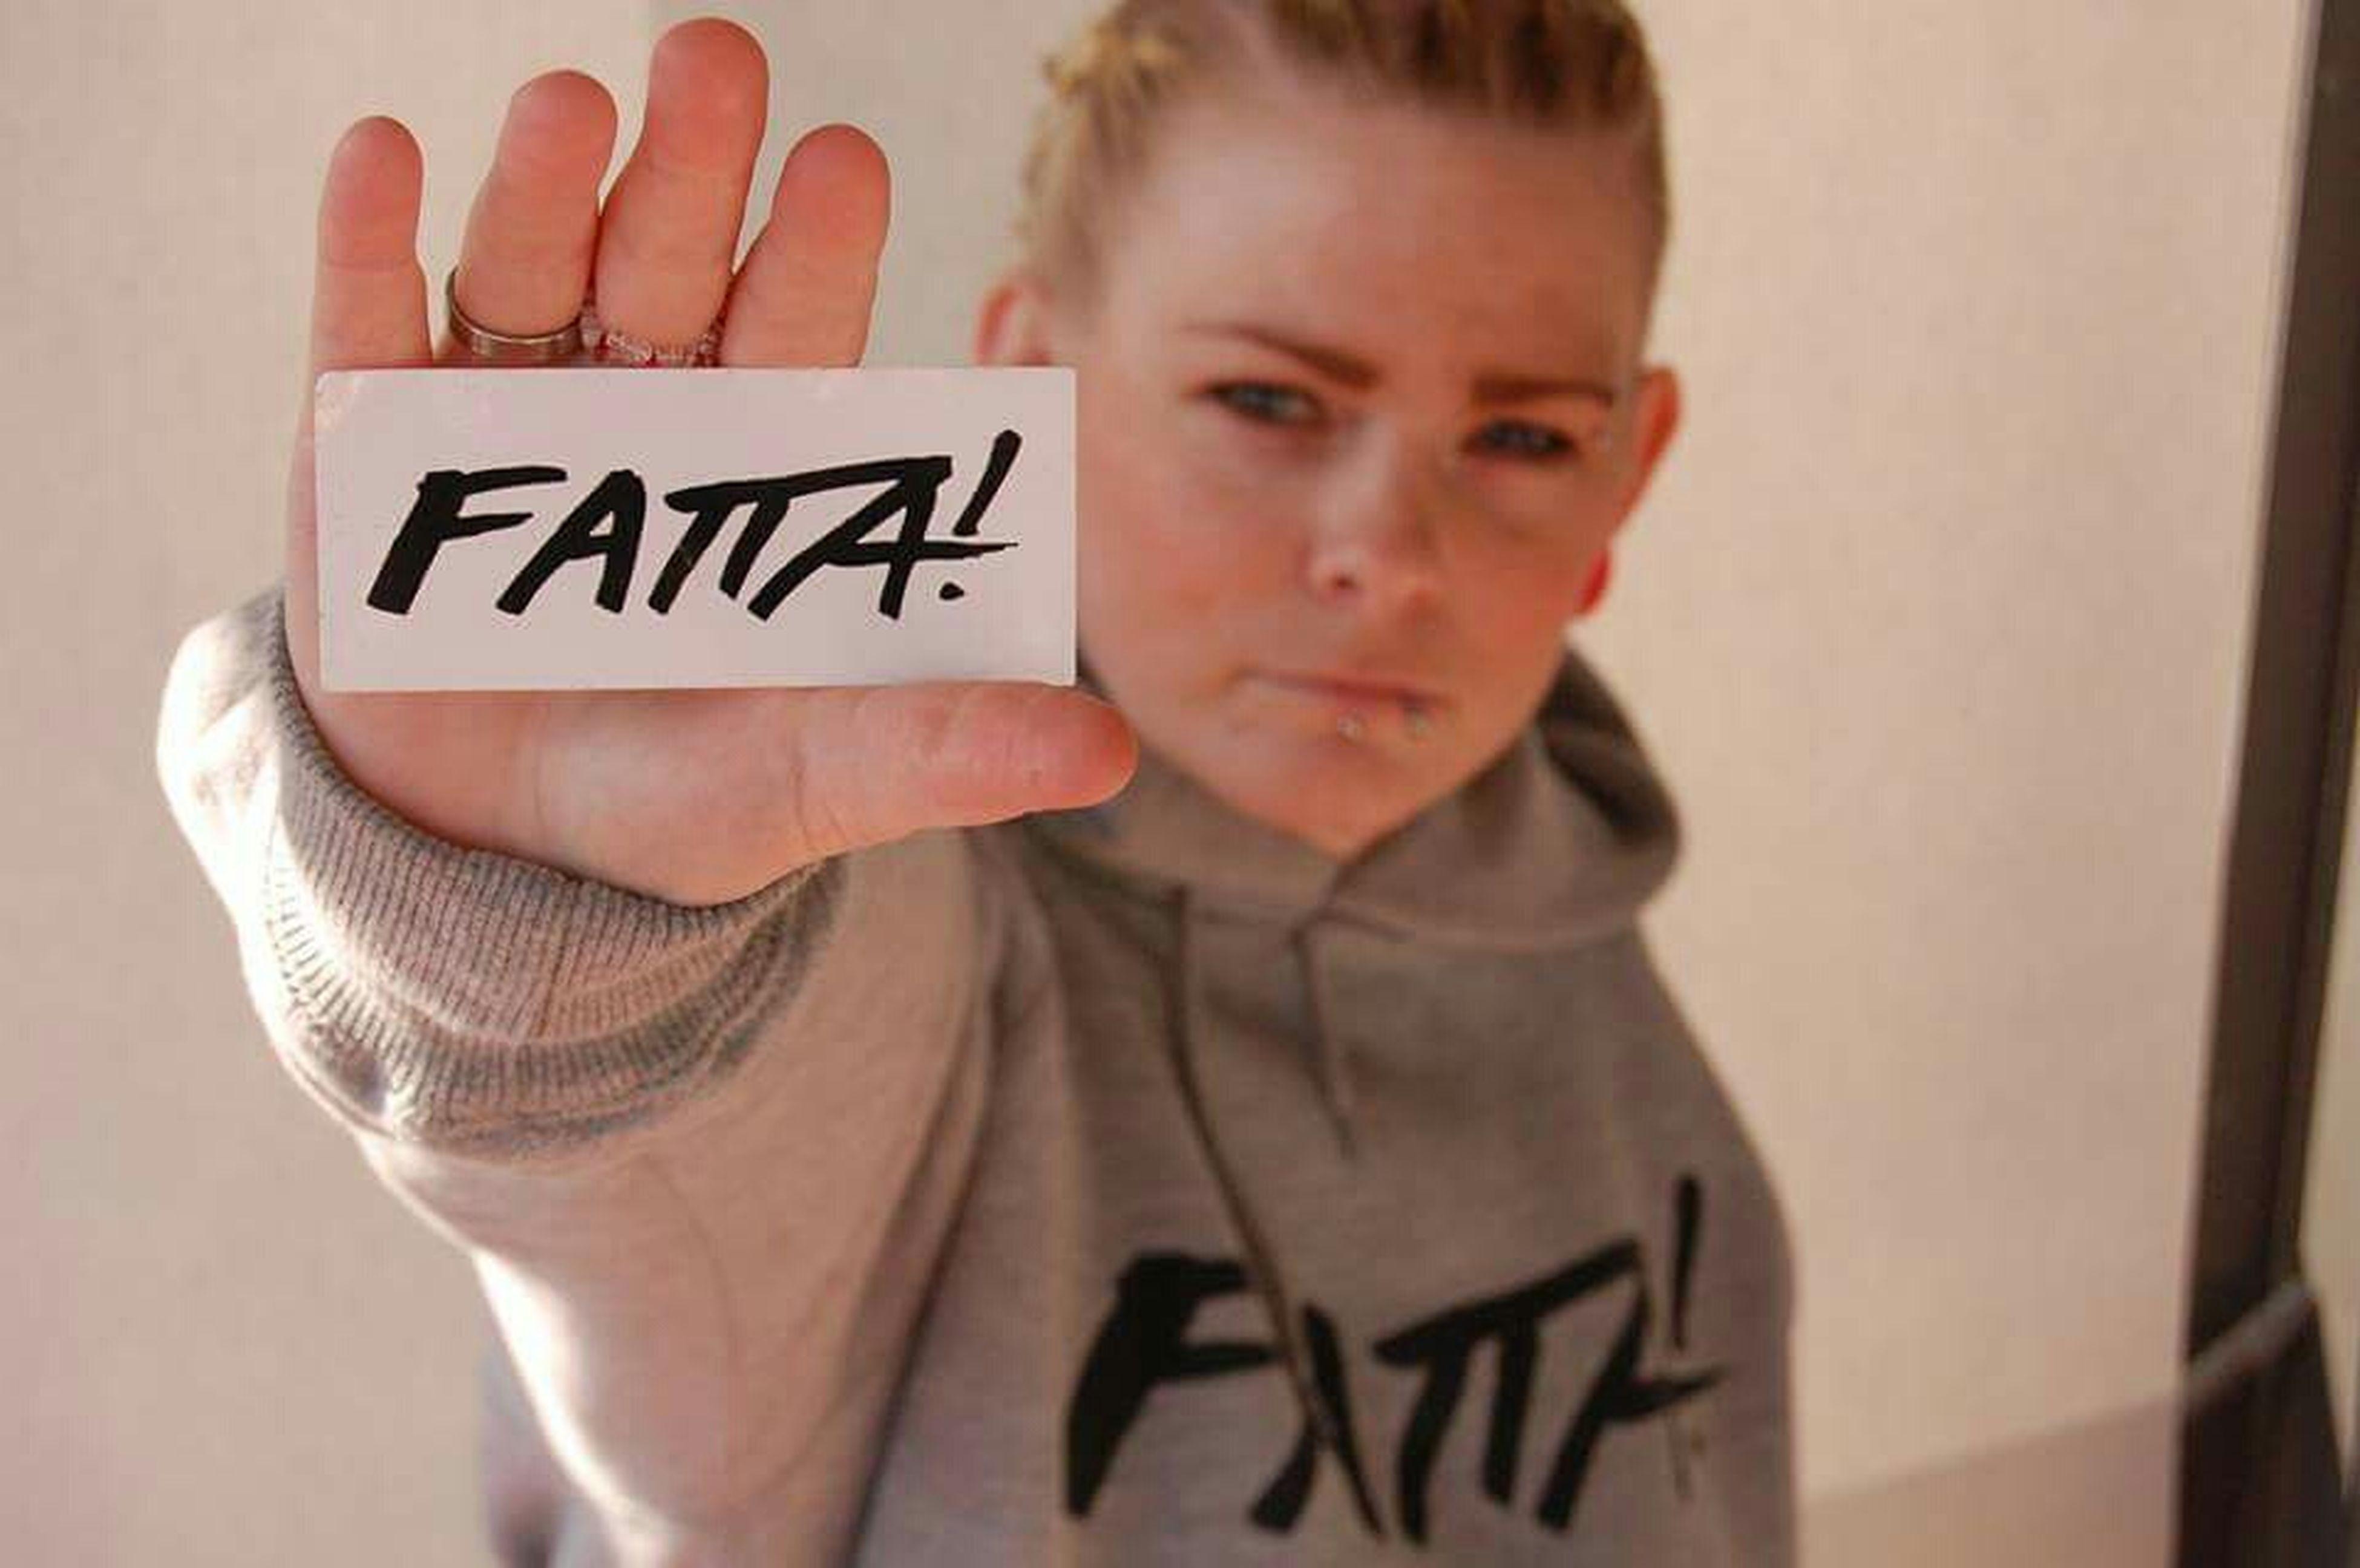 FATTA Fatta Fattanu Fearfuckingsex Equalrights Stopsexualabuse Stopraping Fightrape Me Myself